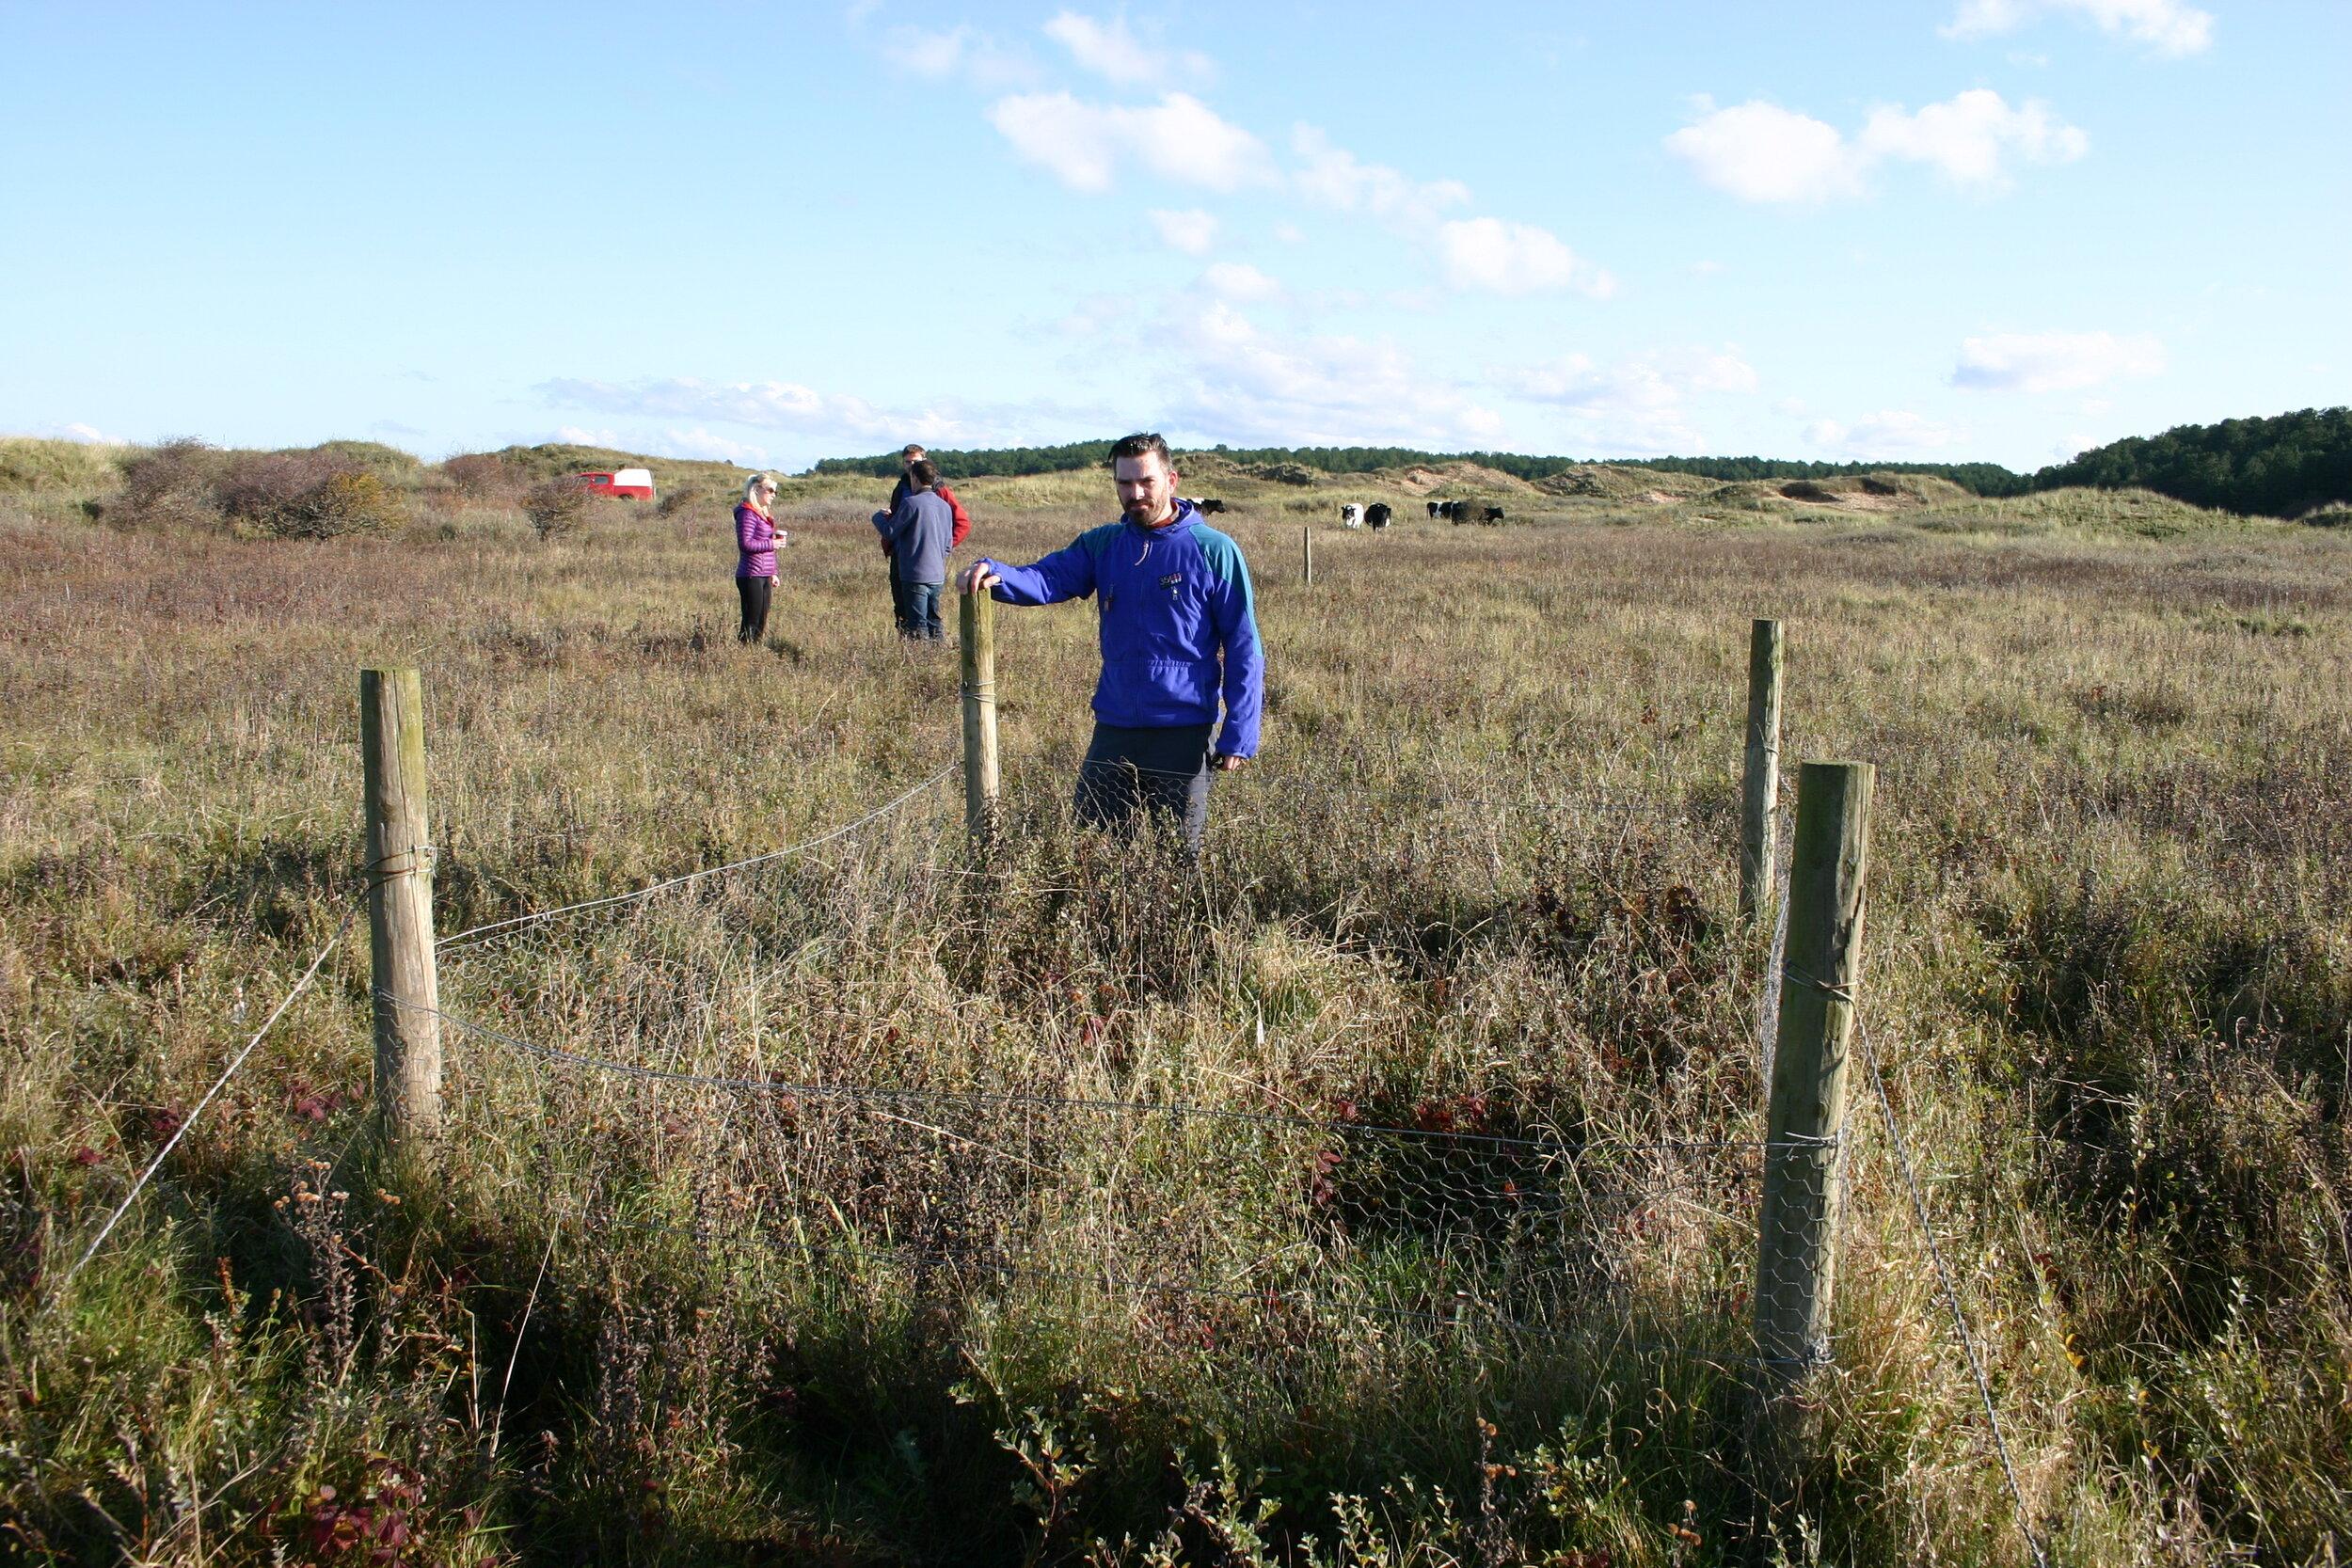 jon millett was the invited speaker at our august webinar on the ainsdale dune slacks Lte in west lancashire